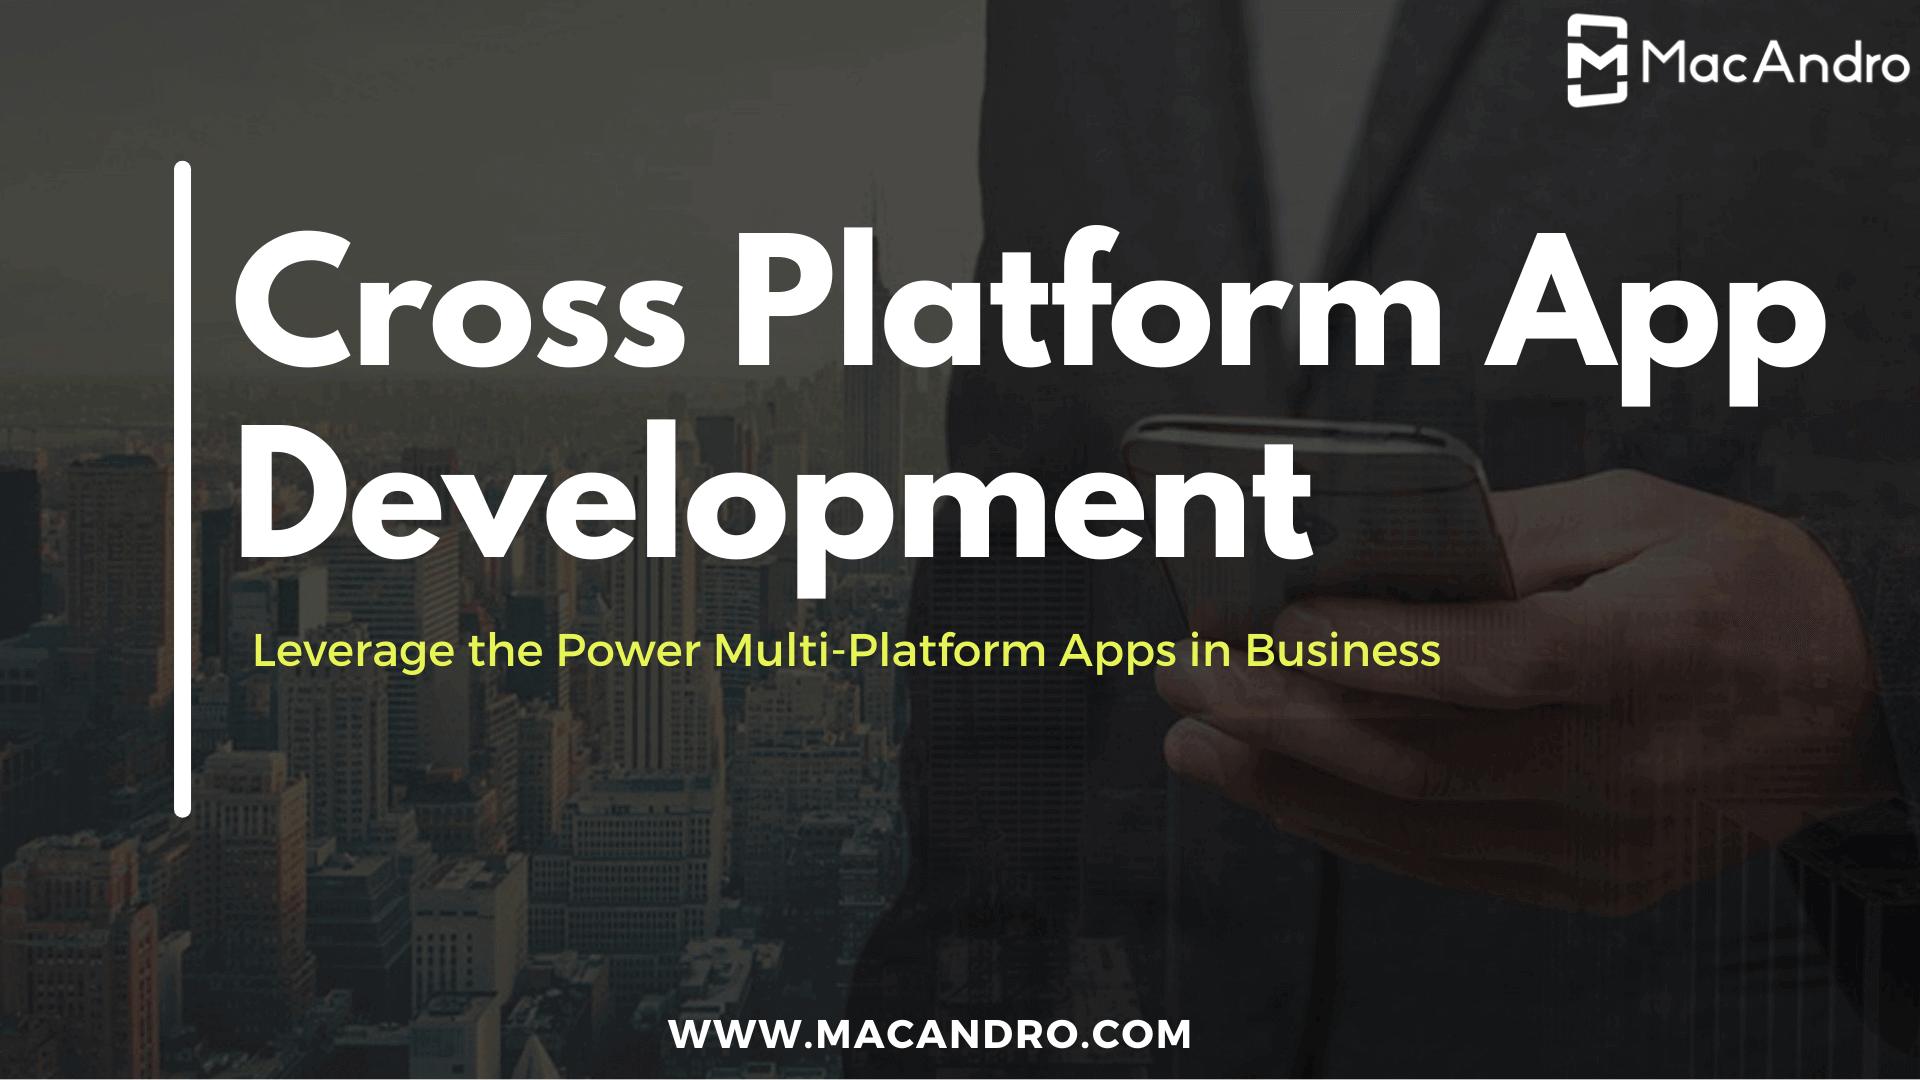 Cross-Platform App Development - Leverage The Power Of Multiplatform Apps For Enterprises